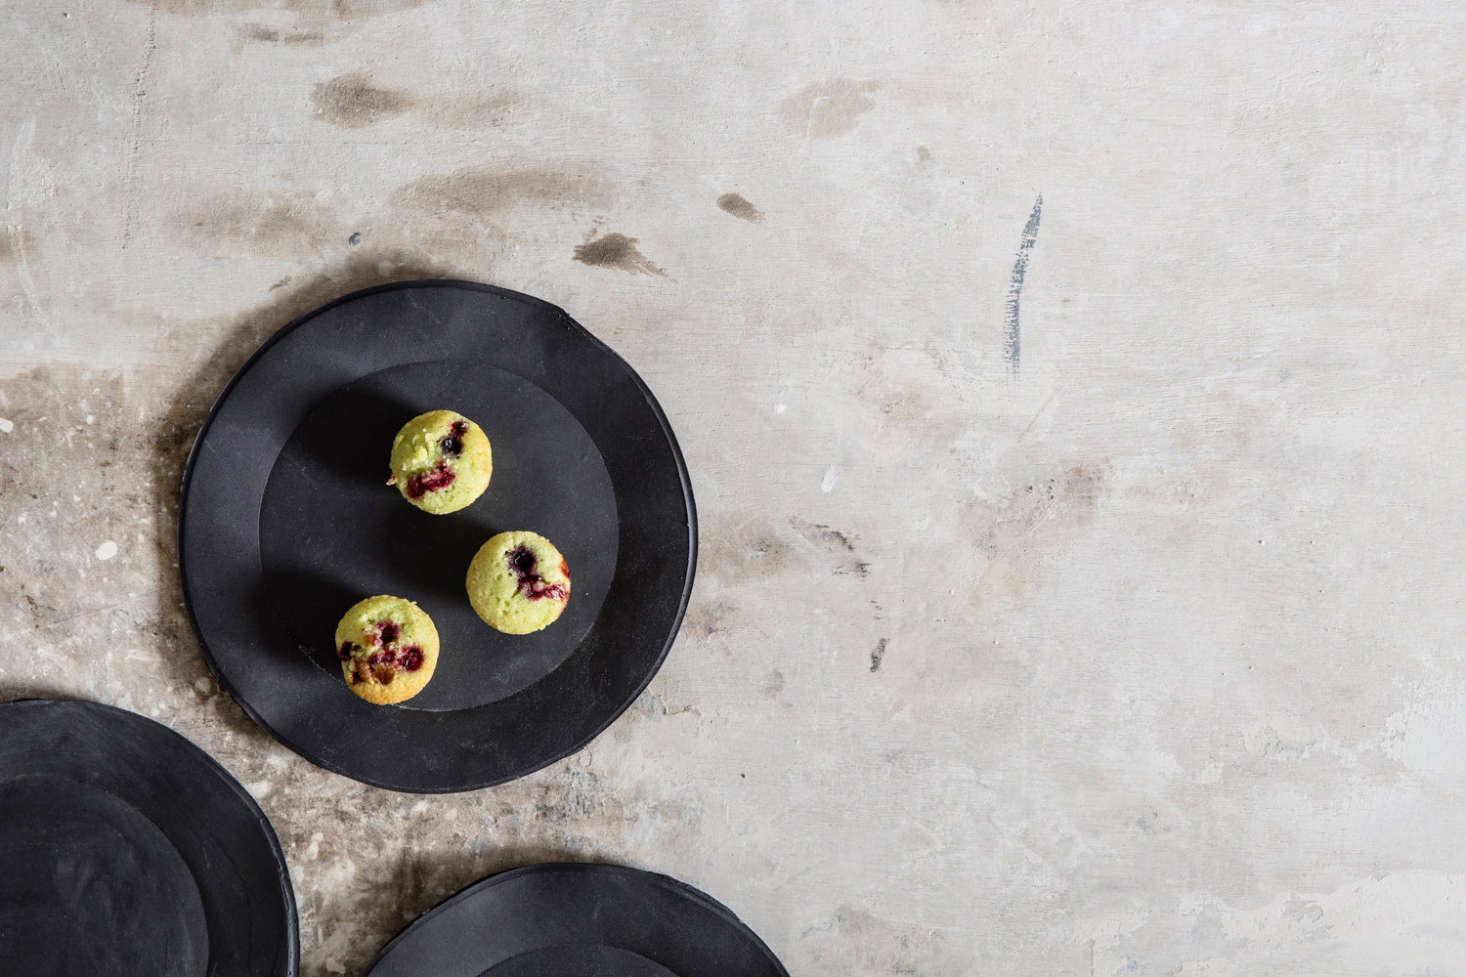 Black Dinnerware from 1220 Ceramics Studio on Etsy